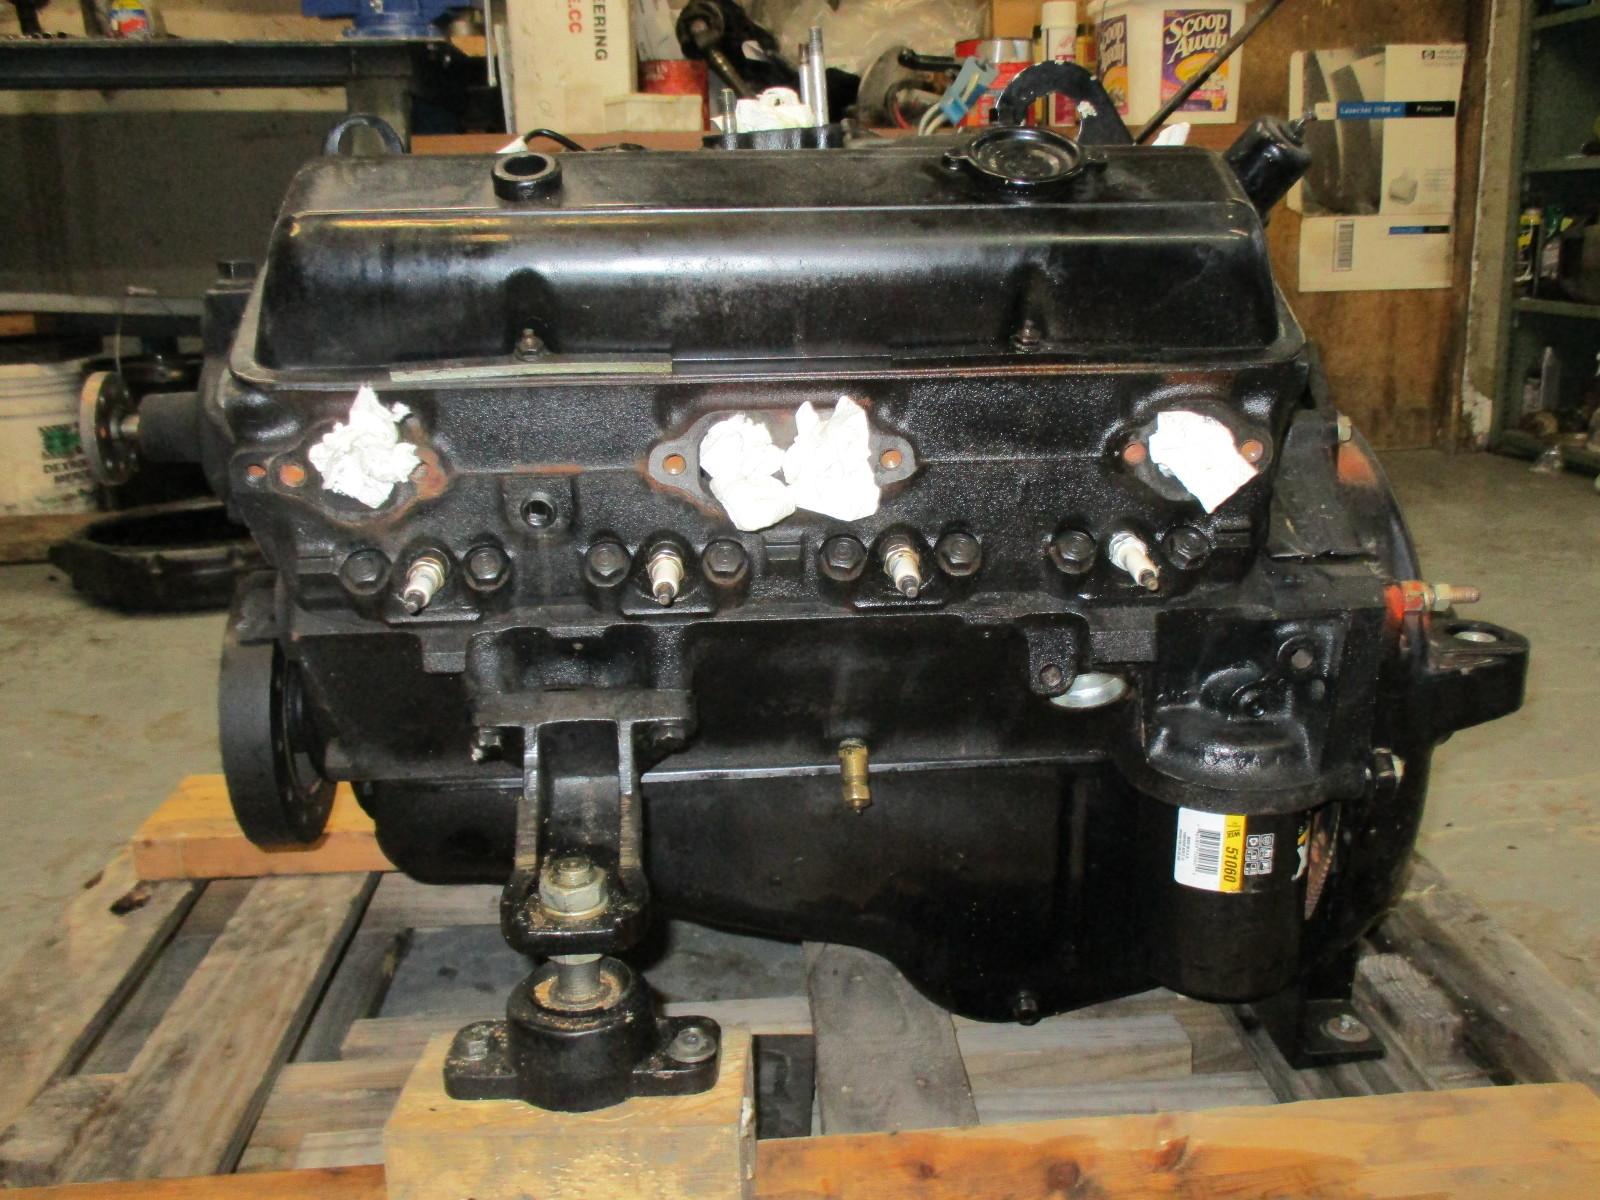 mercruiser or omc 198 hp v8 chevy gm 305 ci engine motor ebay. Black Bedroom Furniture Sets. Home Design Ideas